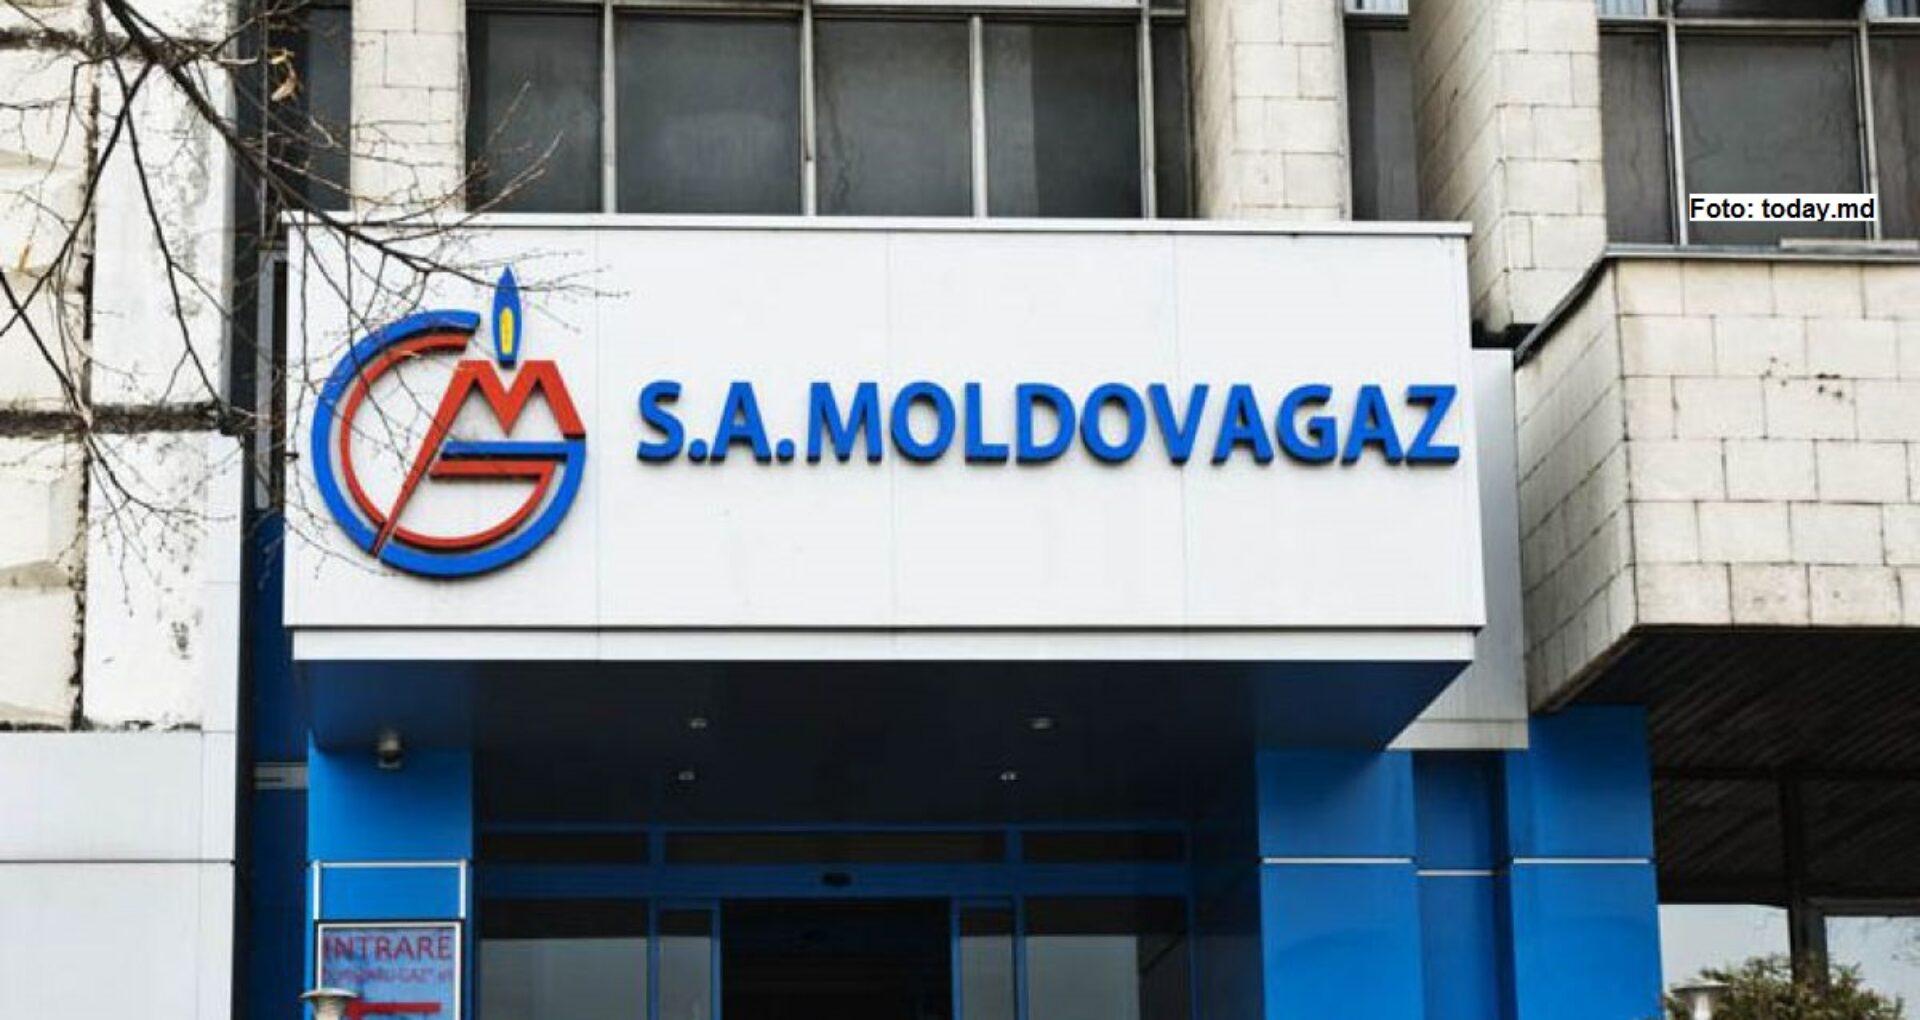 Moldovagaz: Contracte în familie și case de lux